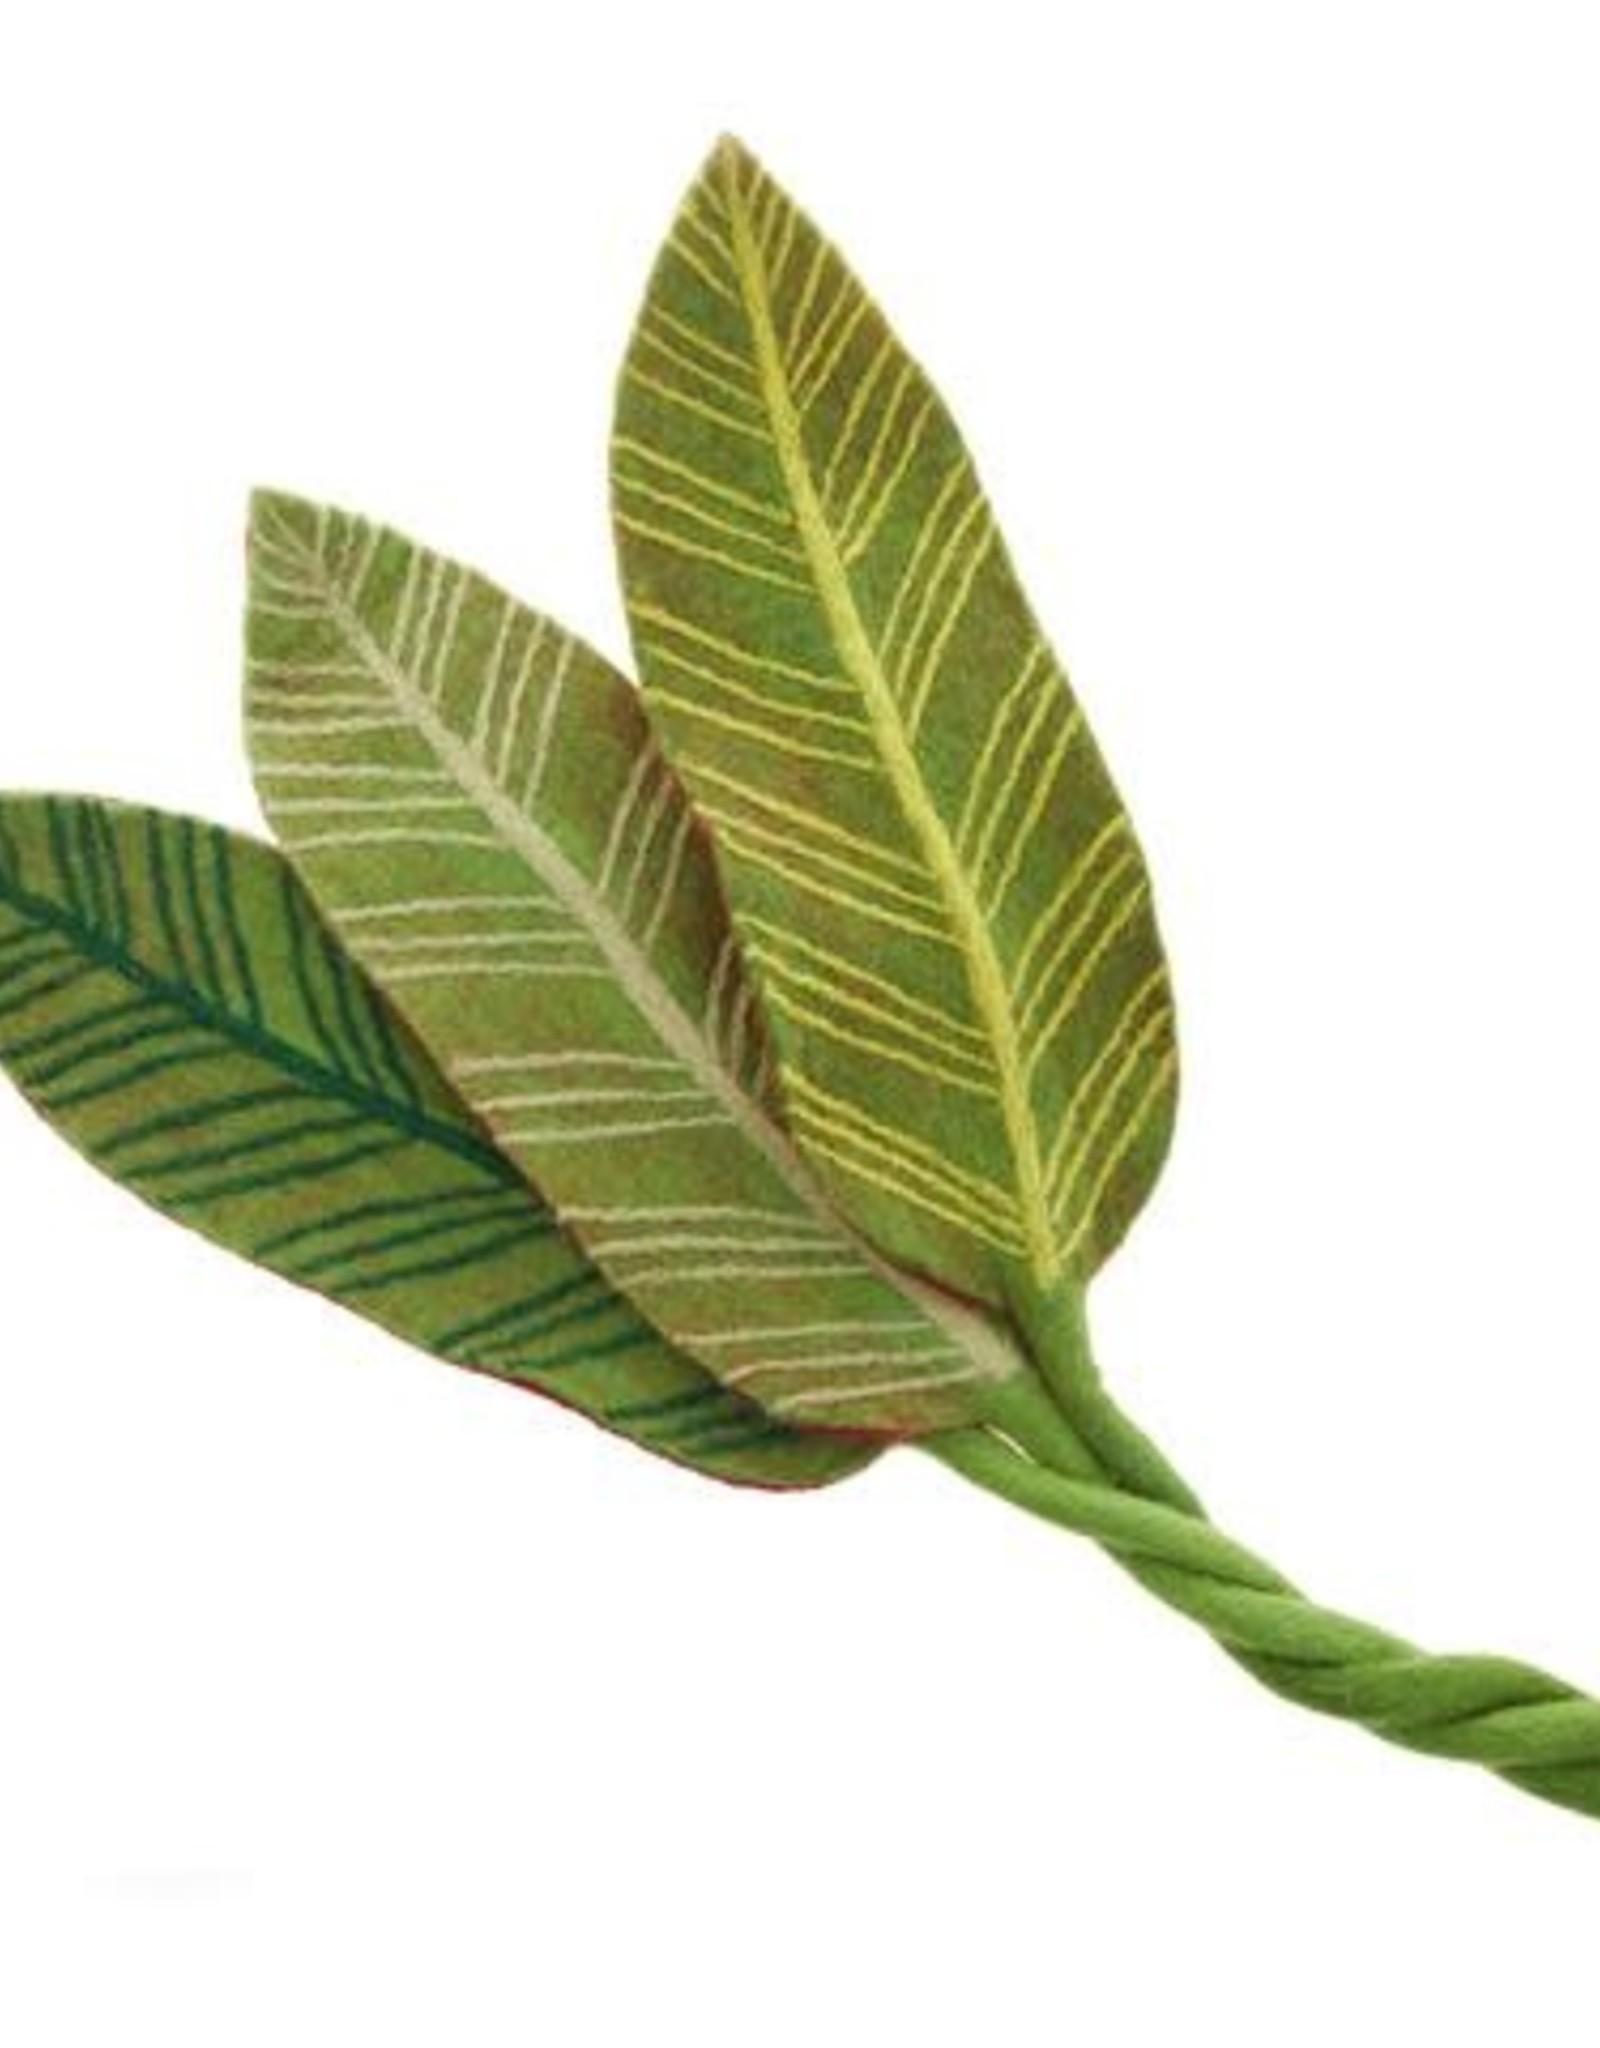 Felt Calathea Leaf